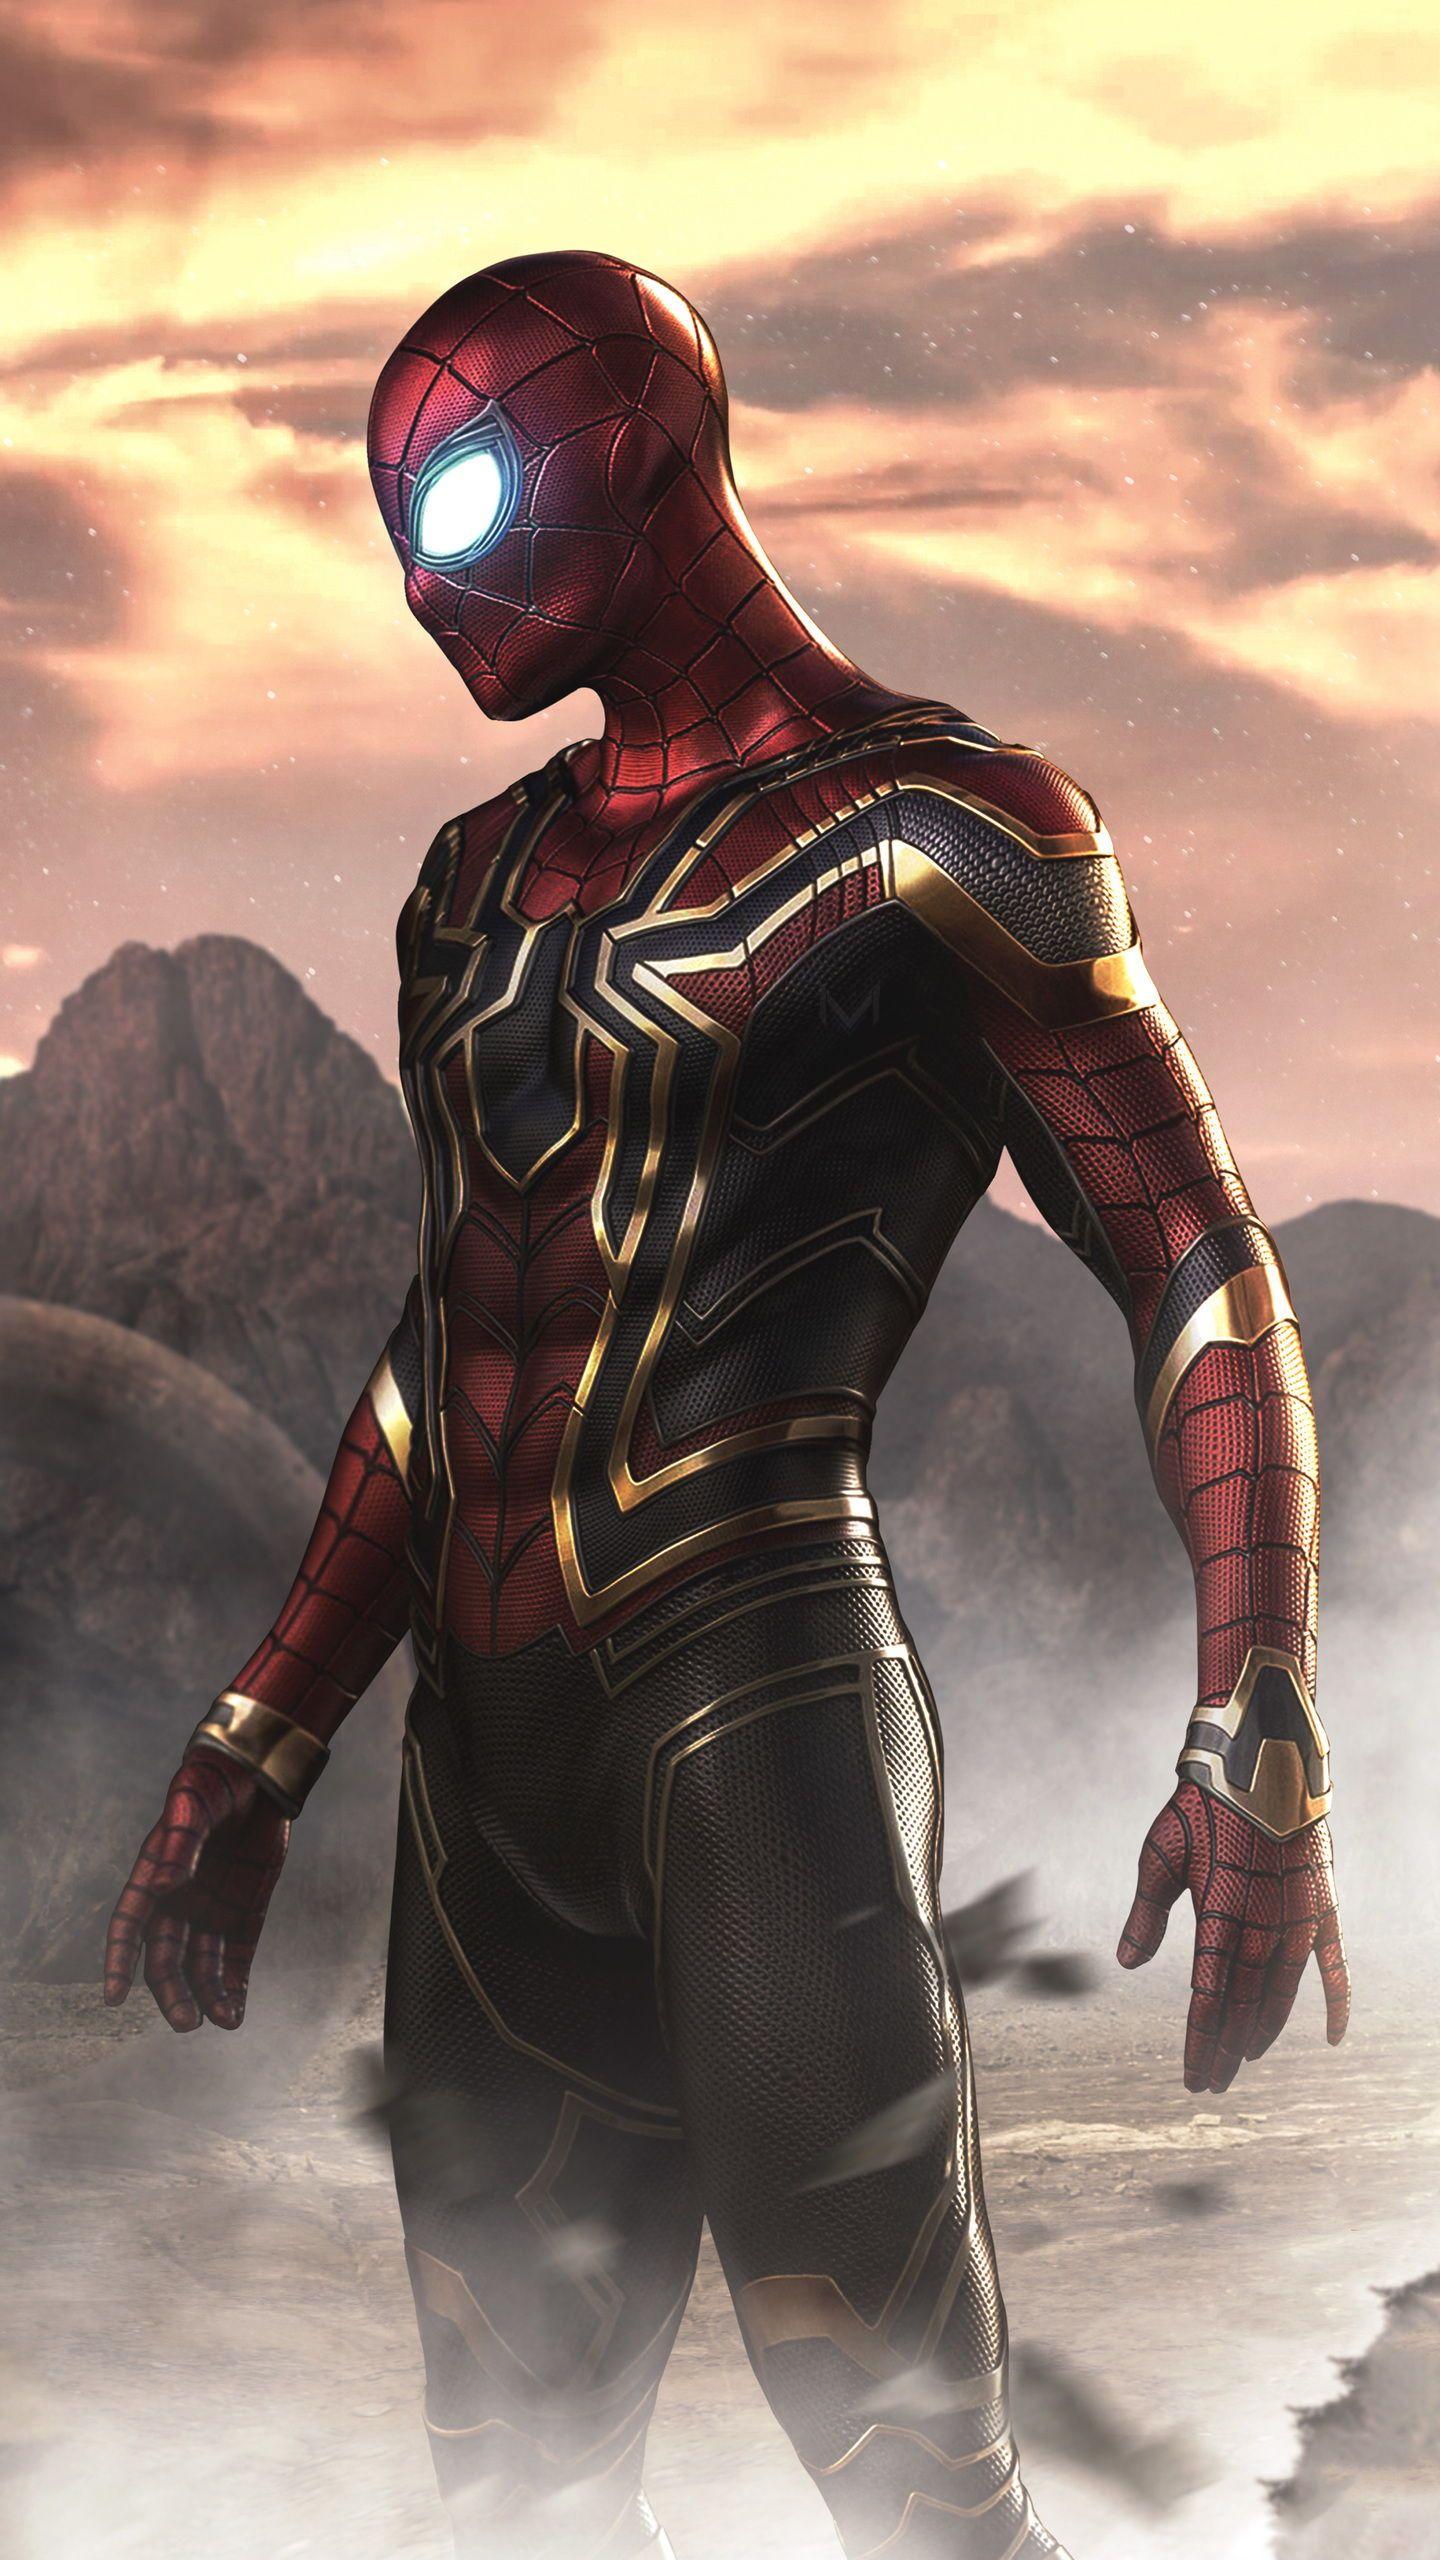 Download Spider Man Hd Wallpapers Follow Wallpaper Hook Spiderman Spider Sony Marvel Costume Makeup Marv Marvel Spiderman Marvel Superheroes Spiderman